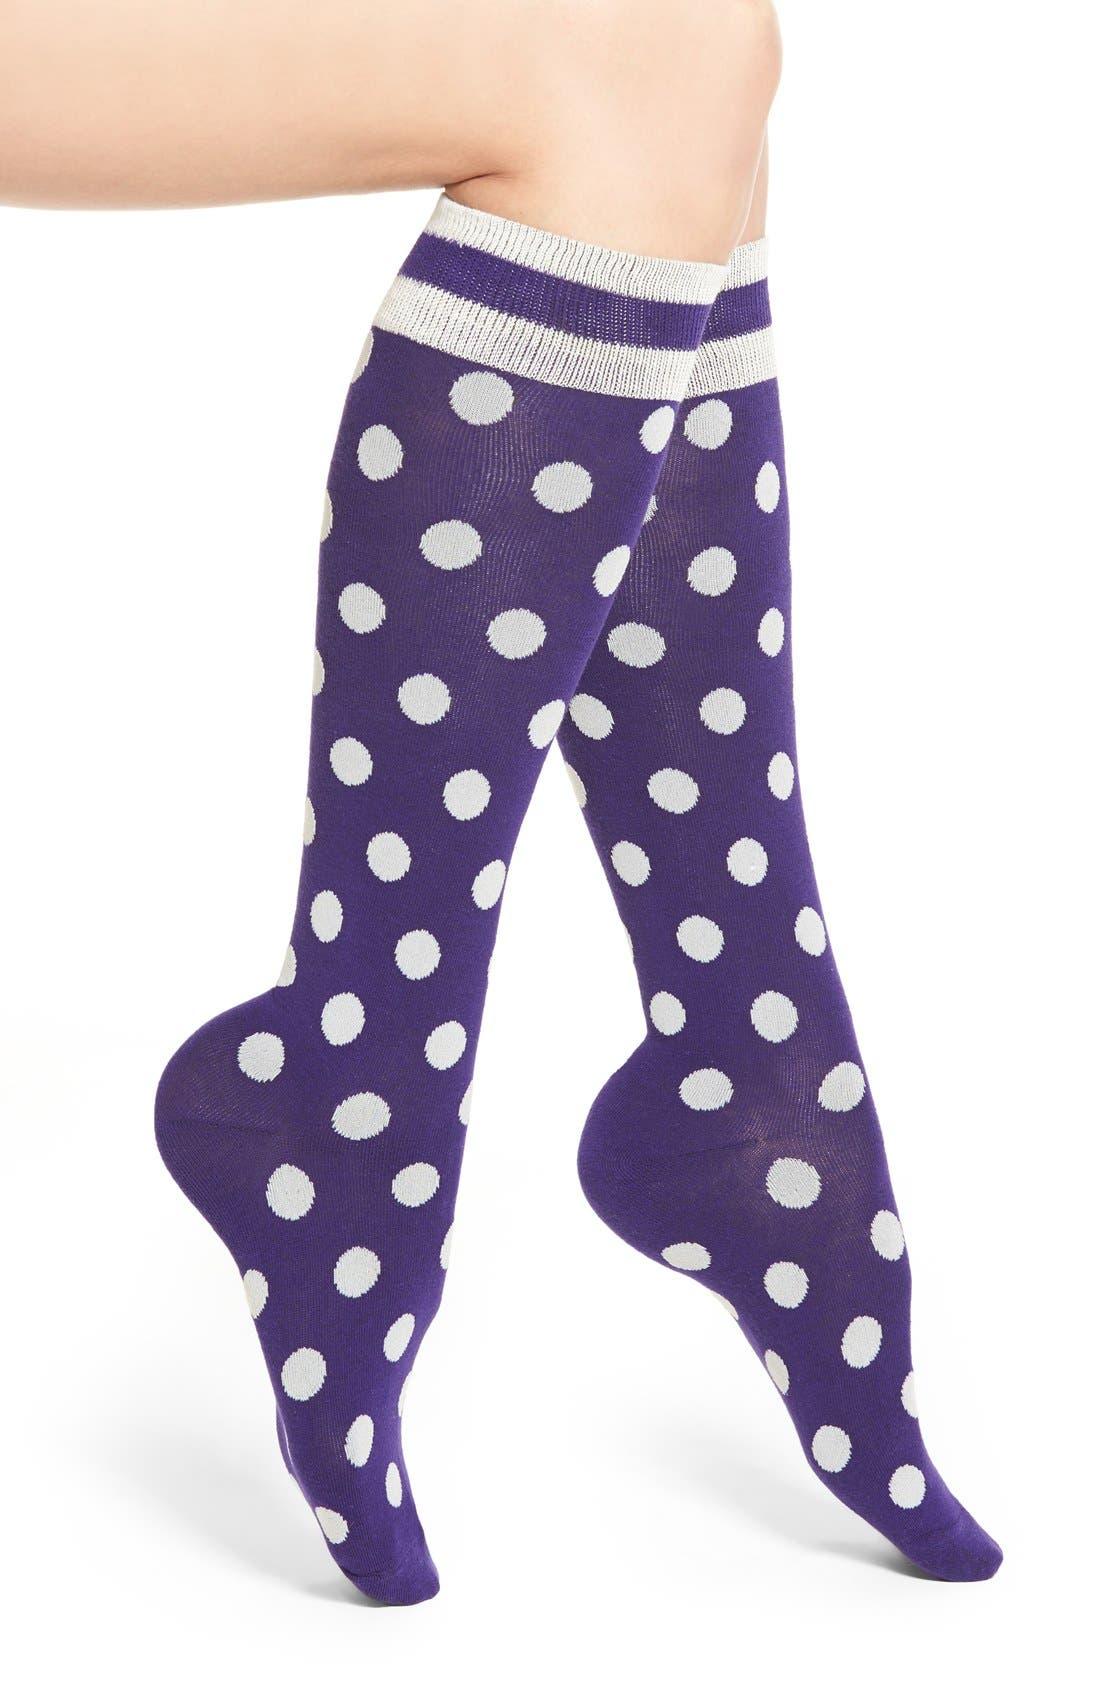 Alternate Image 1 Selected - kate spade new yoke polka dot knee high socks